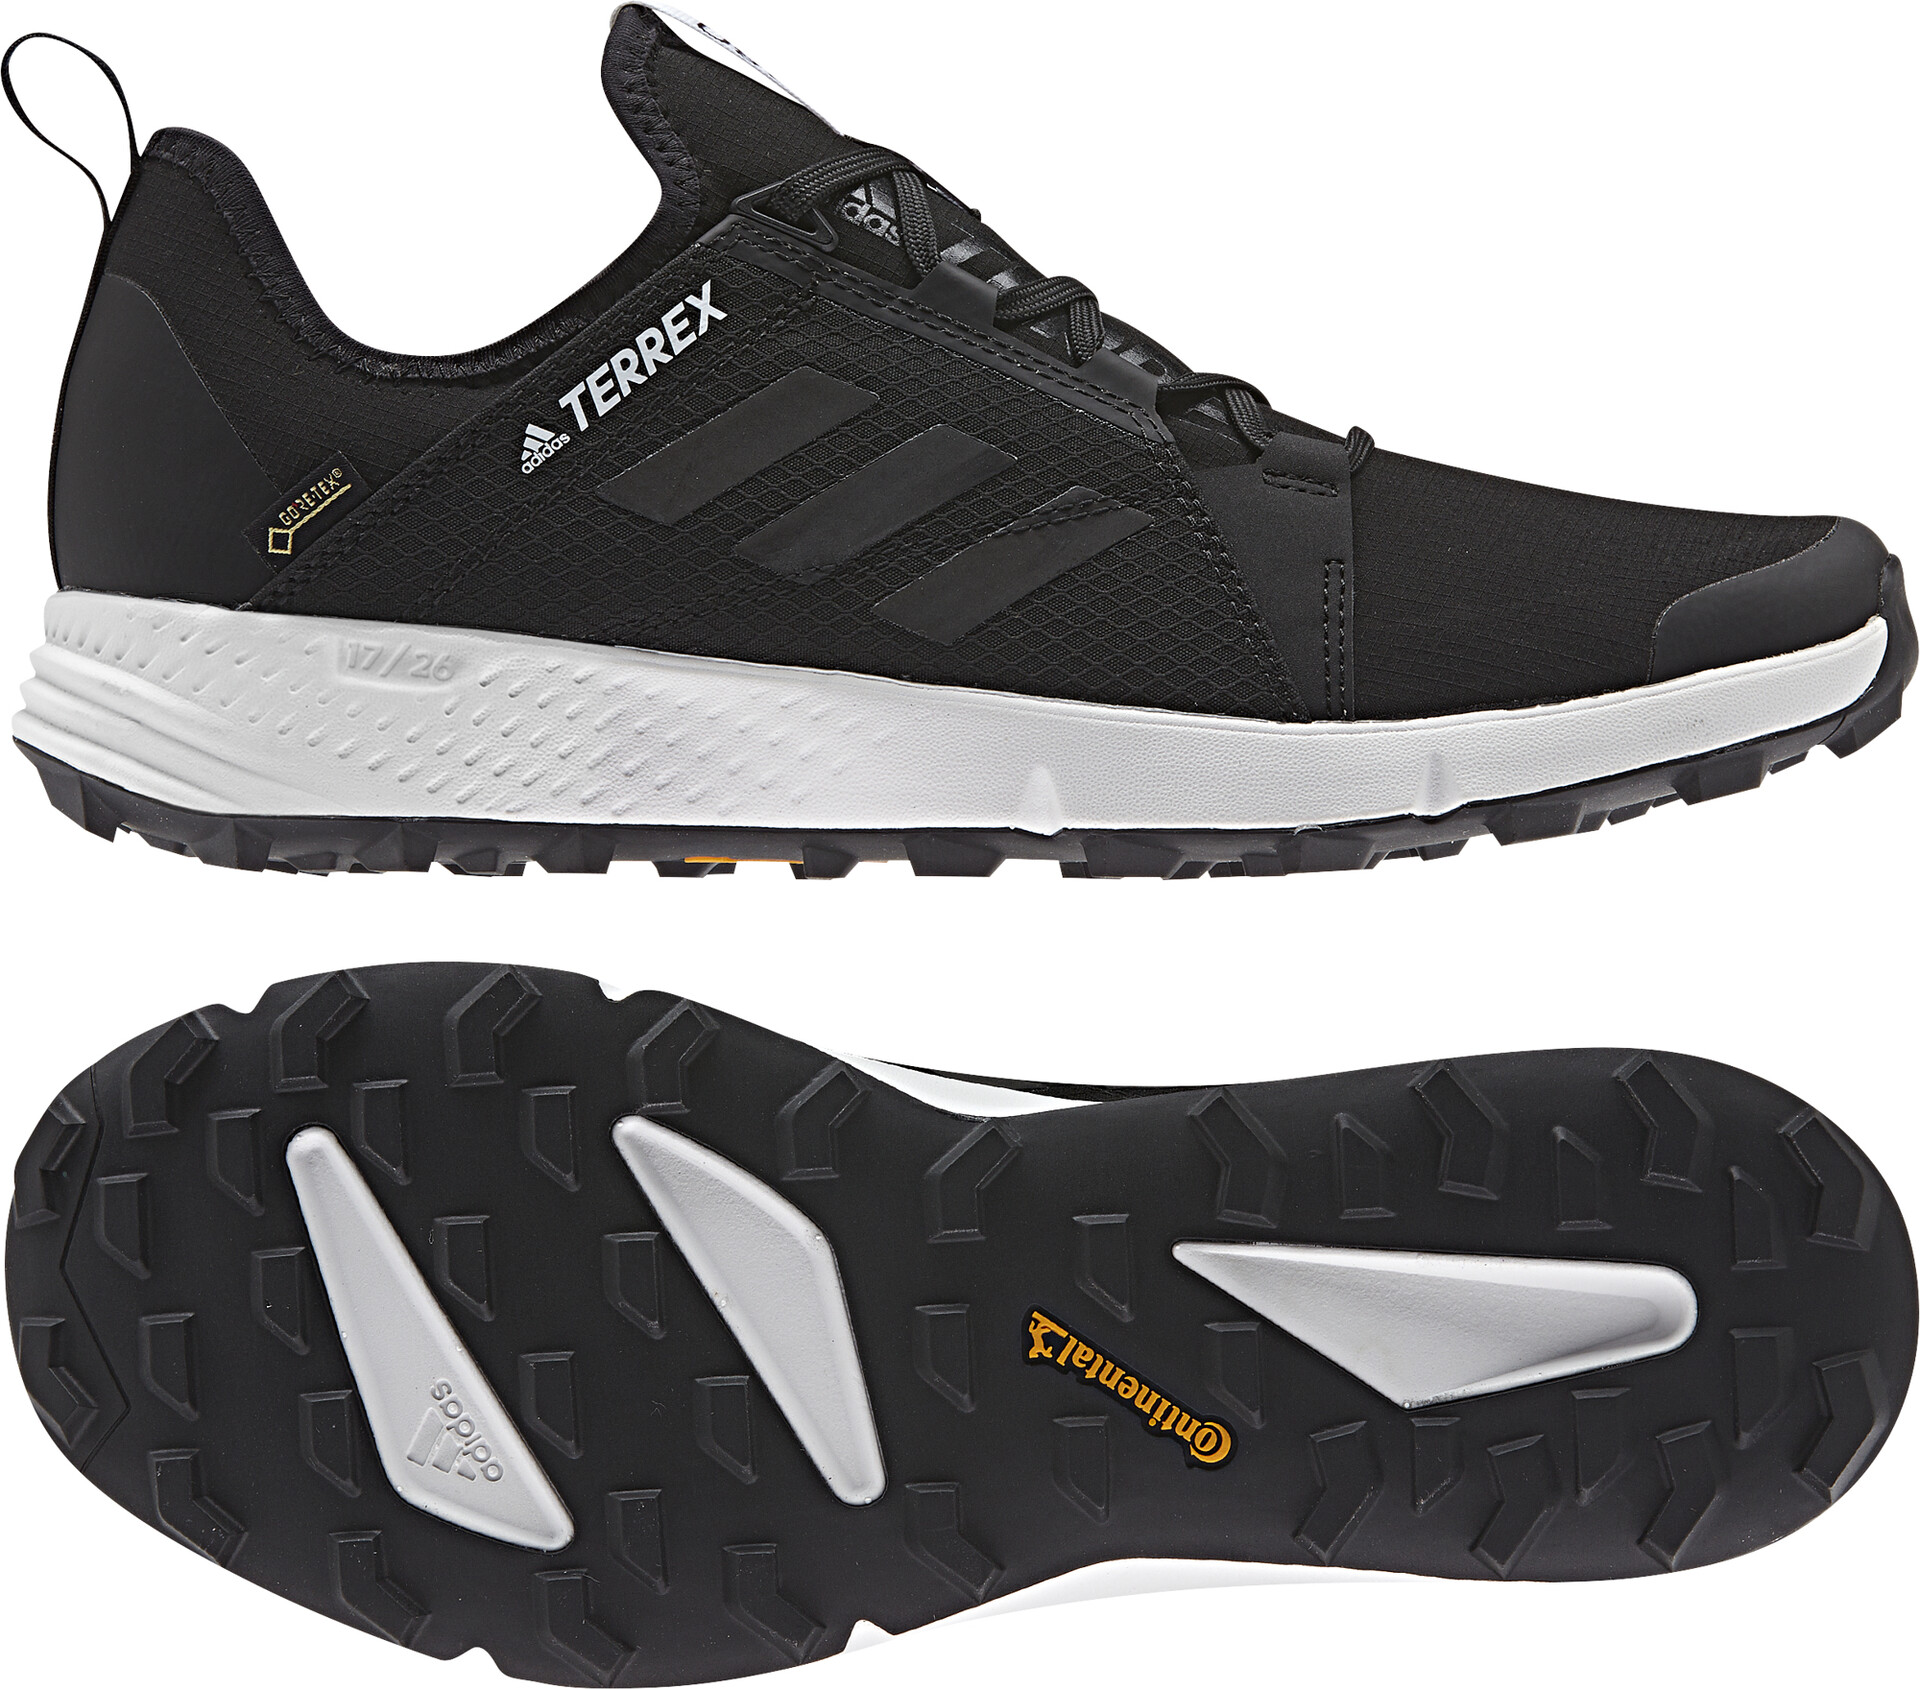 Noir Agravic Chaussures Homme Adidas Terrex Speed Gtx Running PTwOikXZul